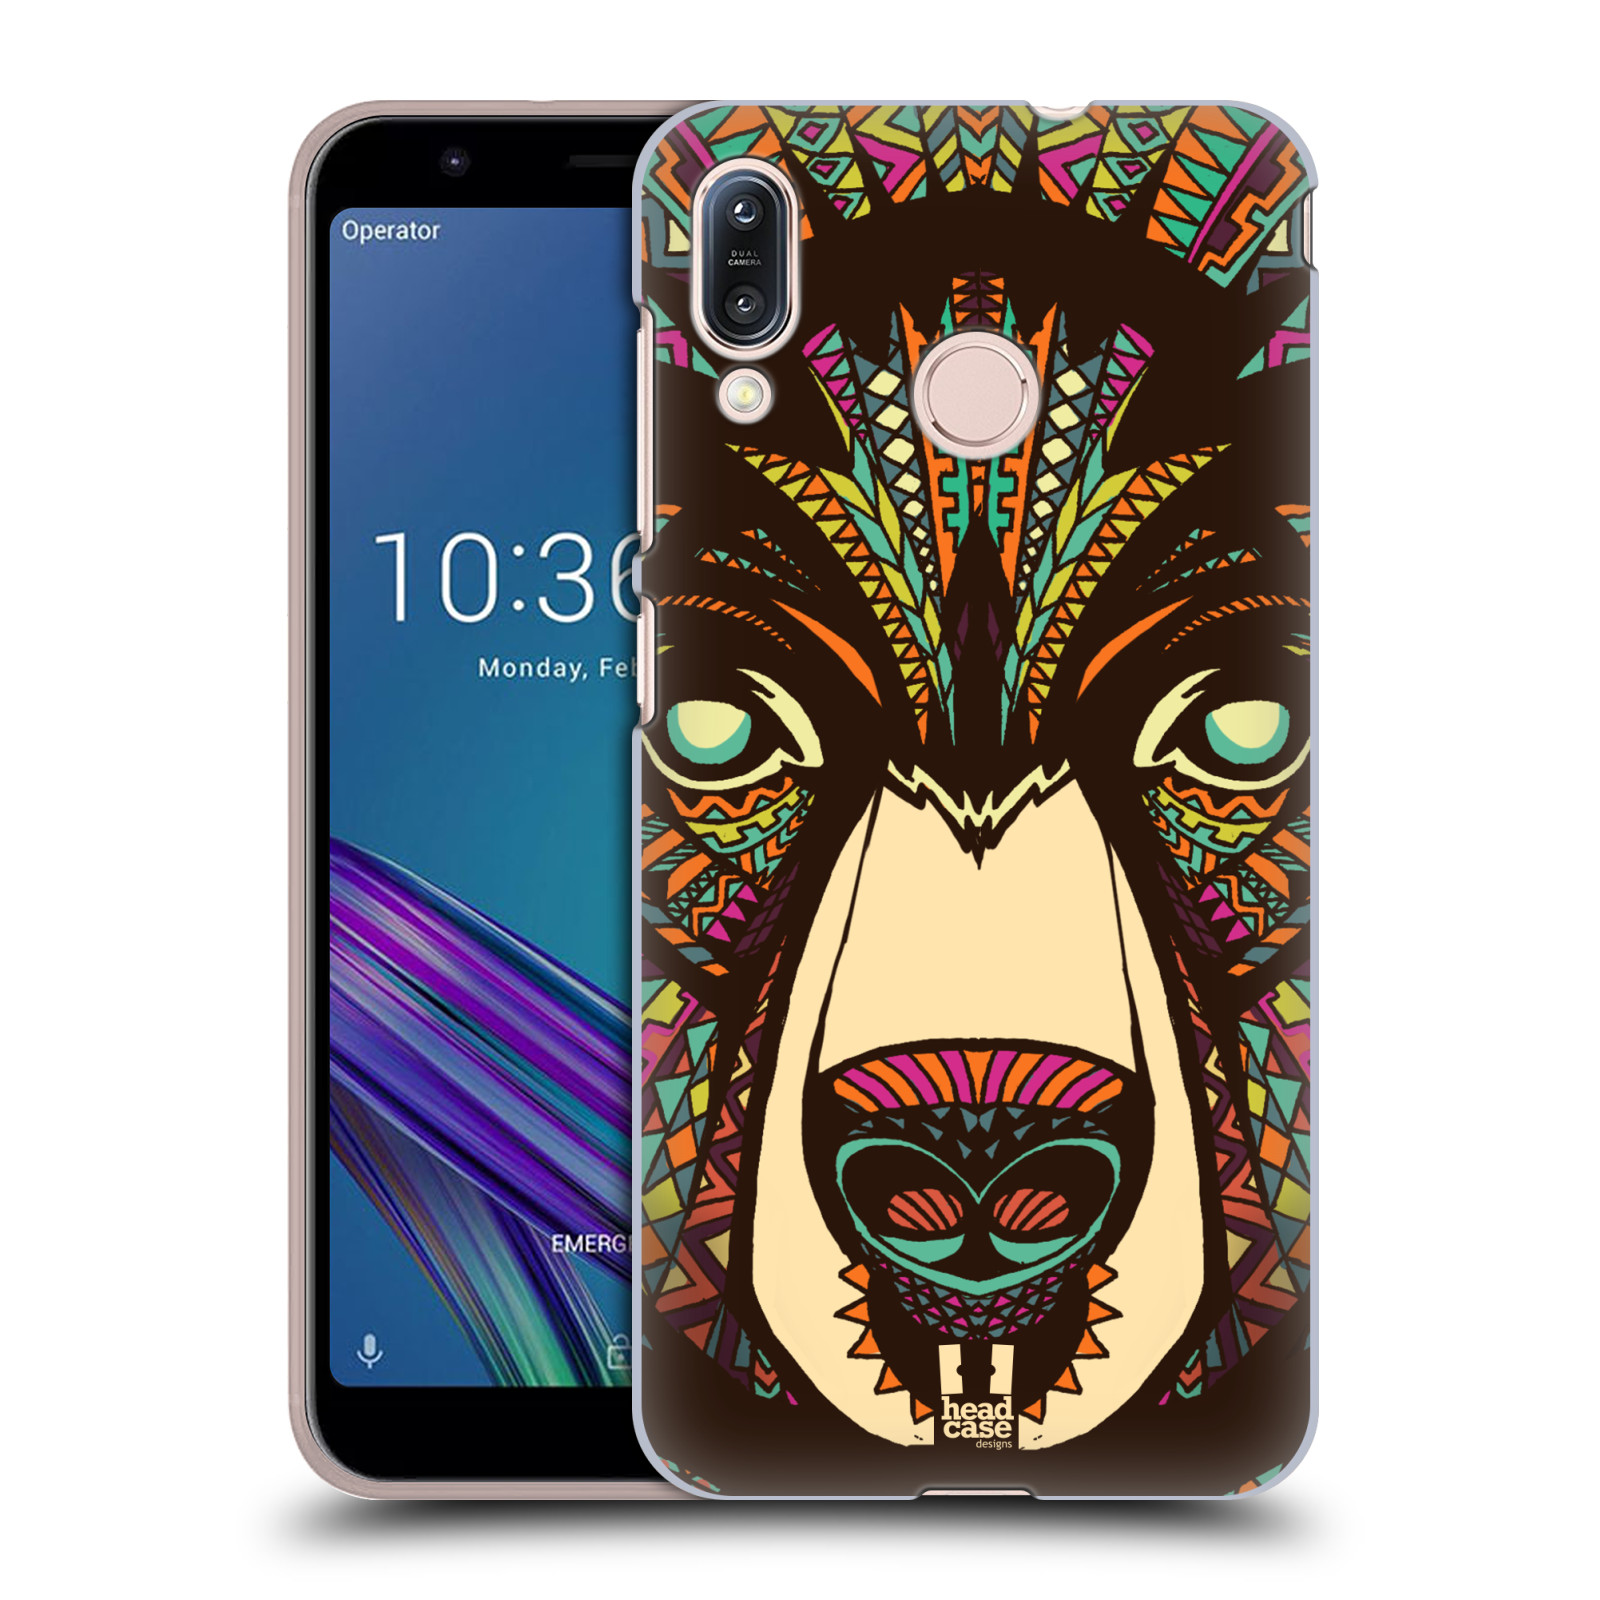 Plastové pouzdro na mobil Asus Zenfone Max M1 ZB555KL - Head Case - AZTEC MEDVĚD